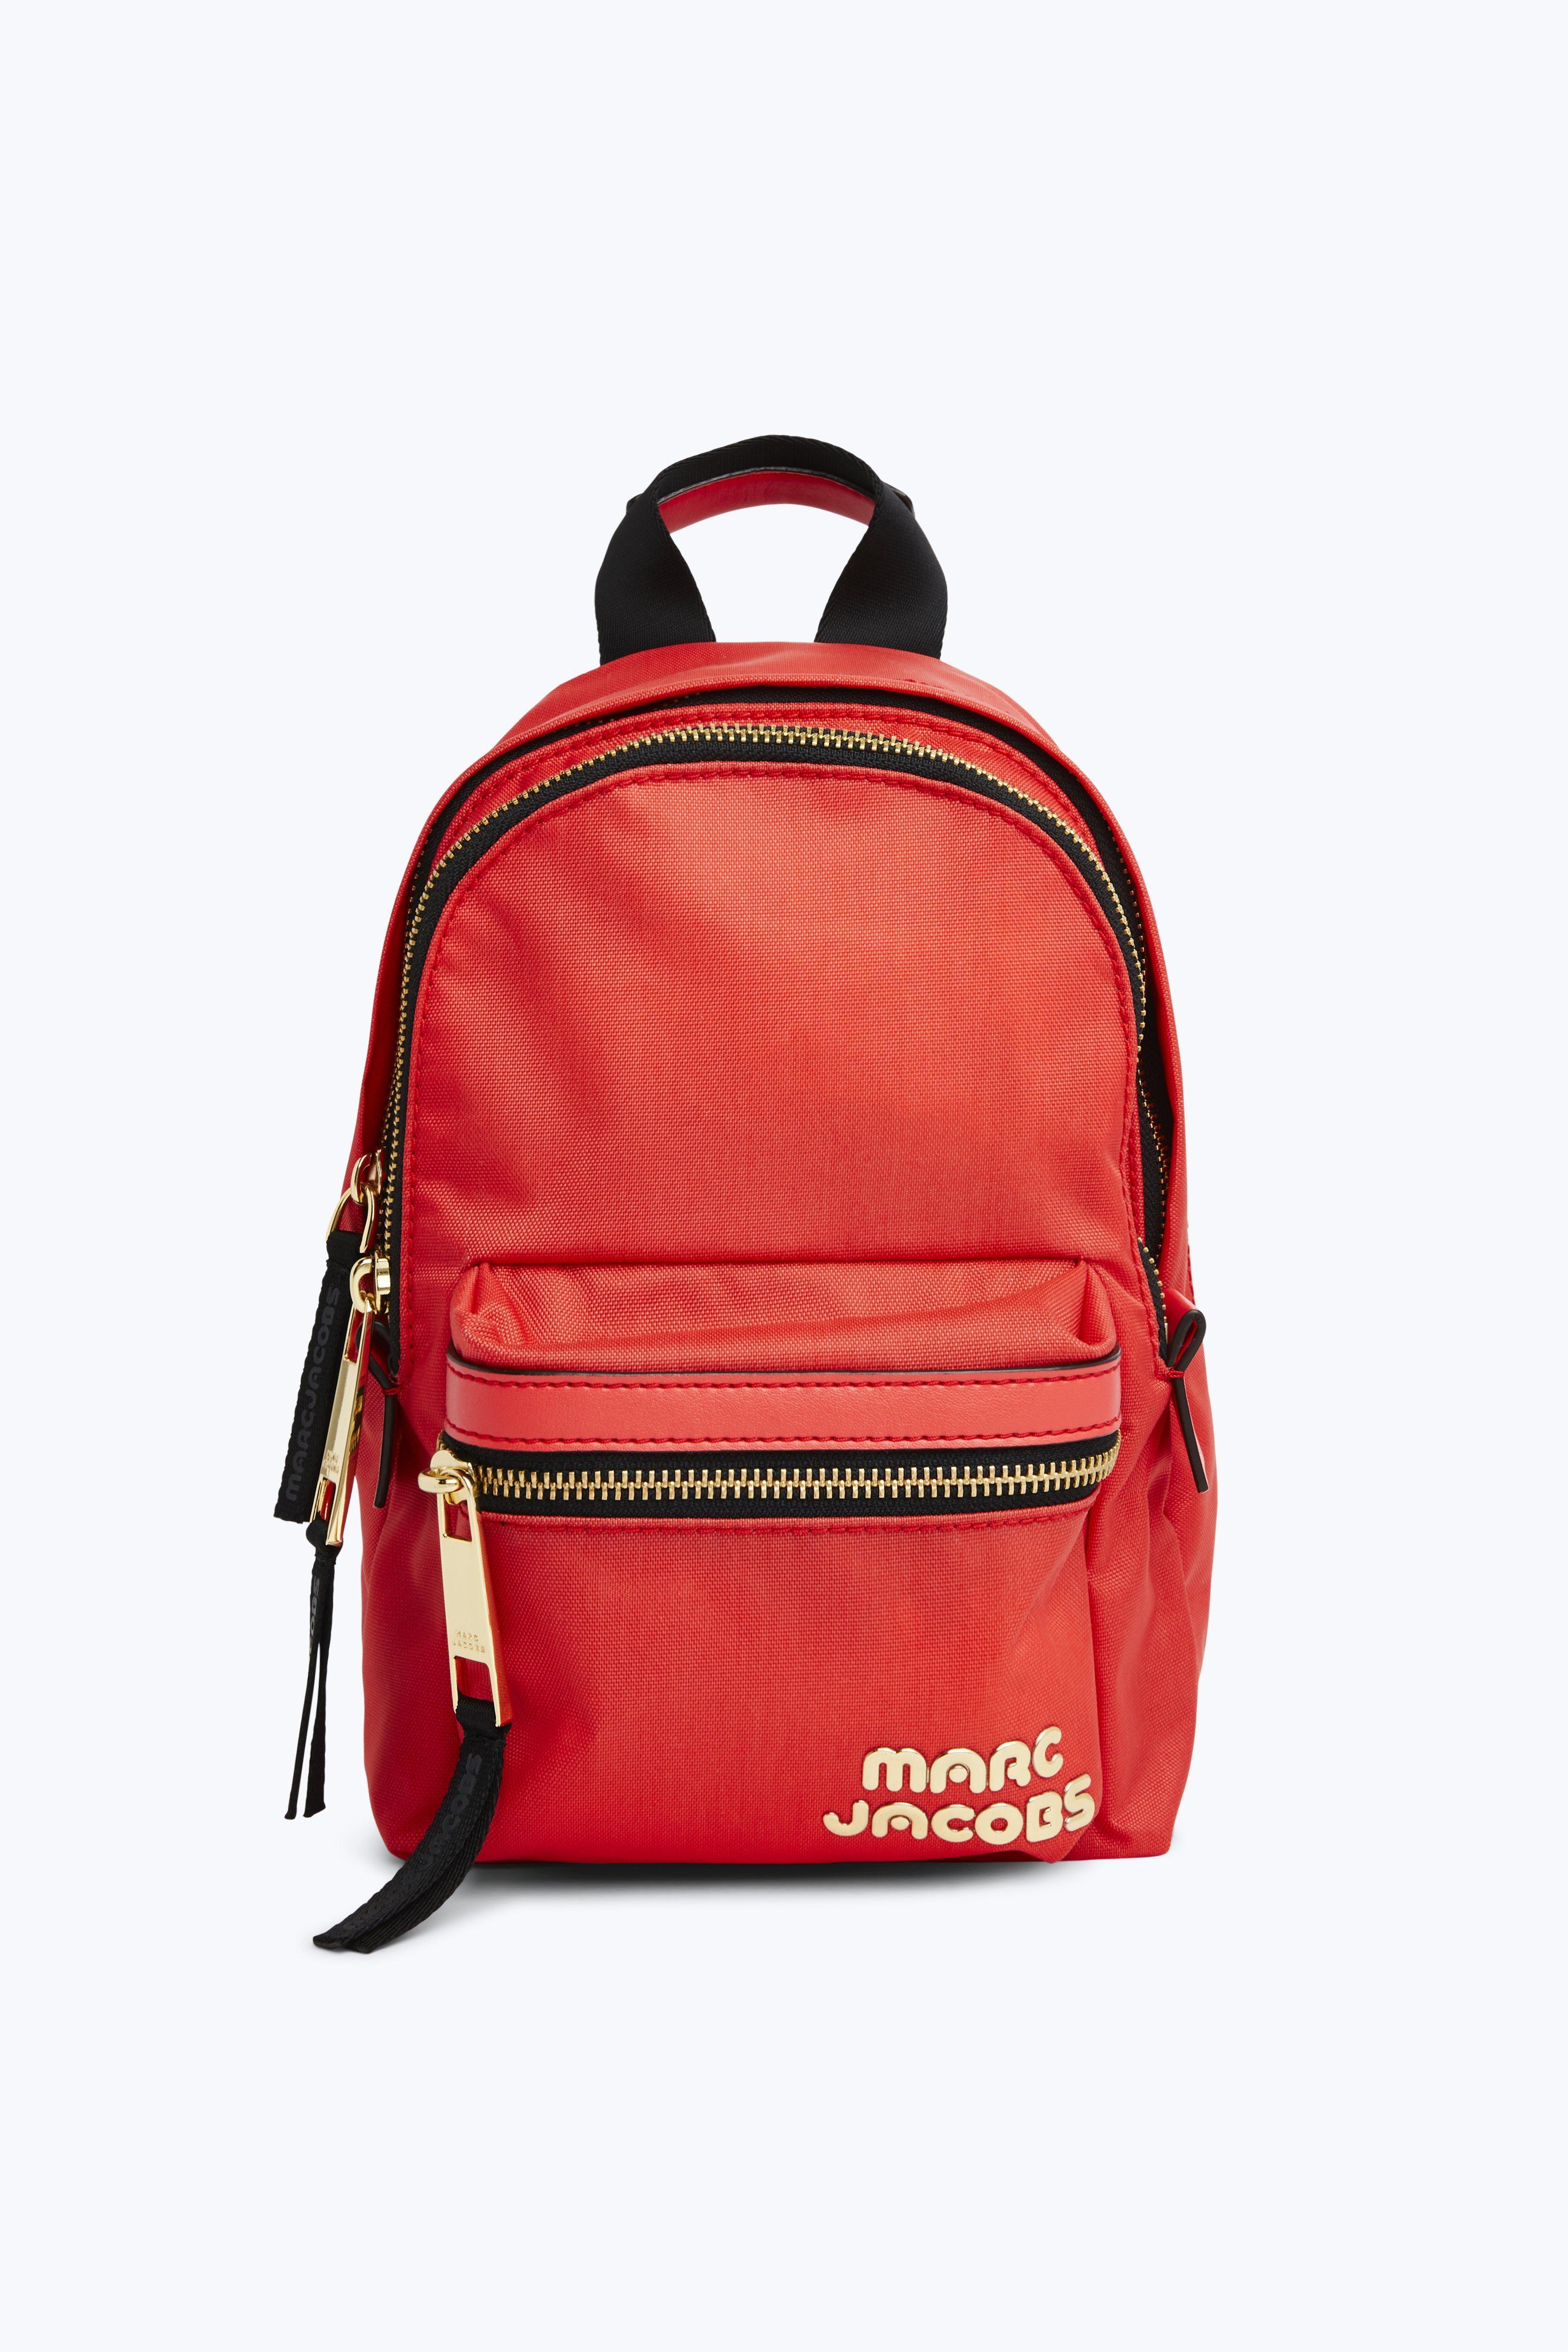 trek pack medium backpack - Red Marc Jacobs LROVvM5